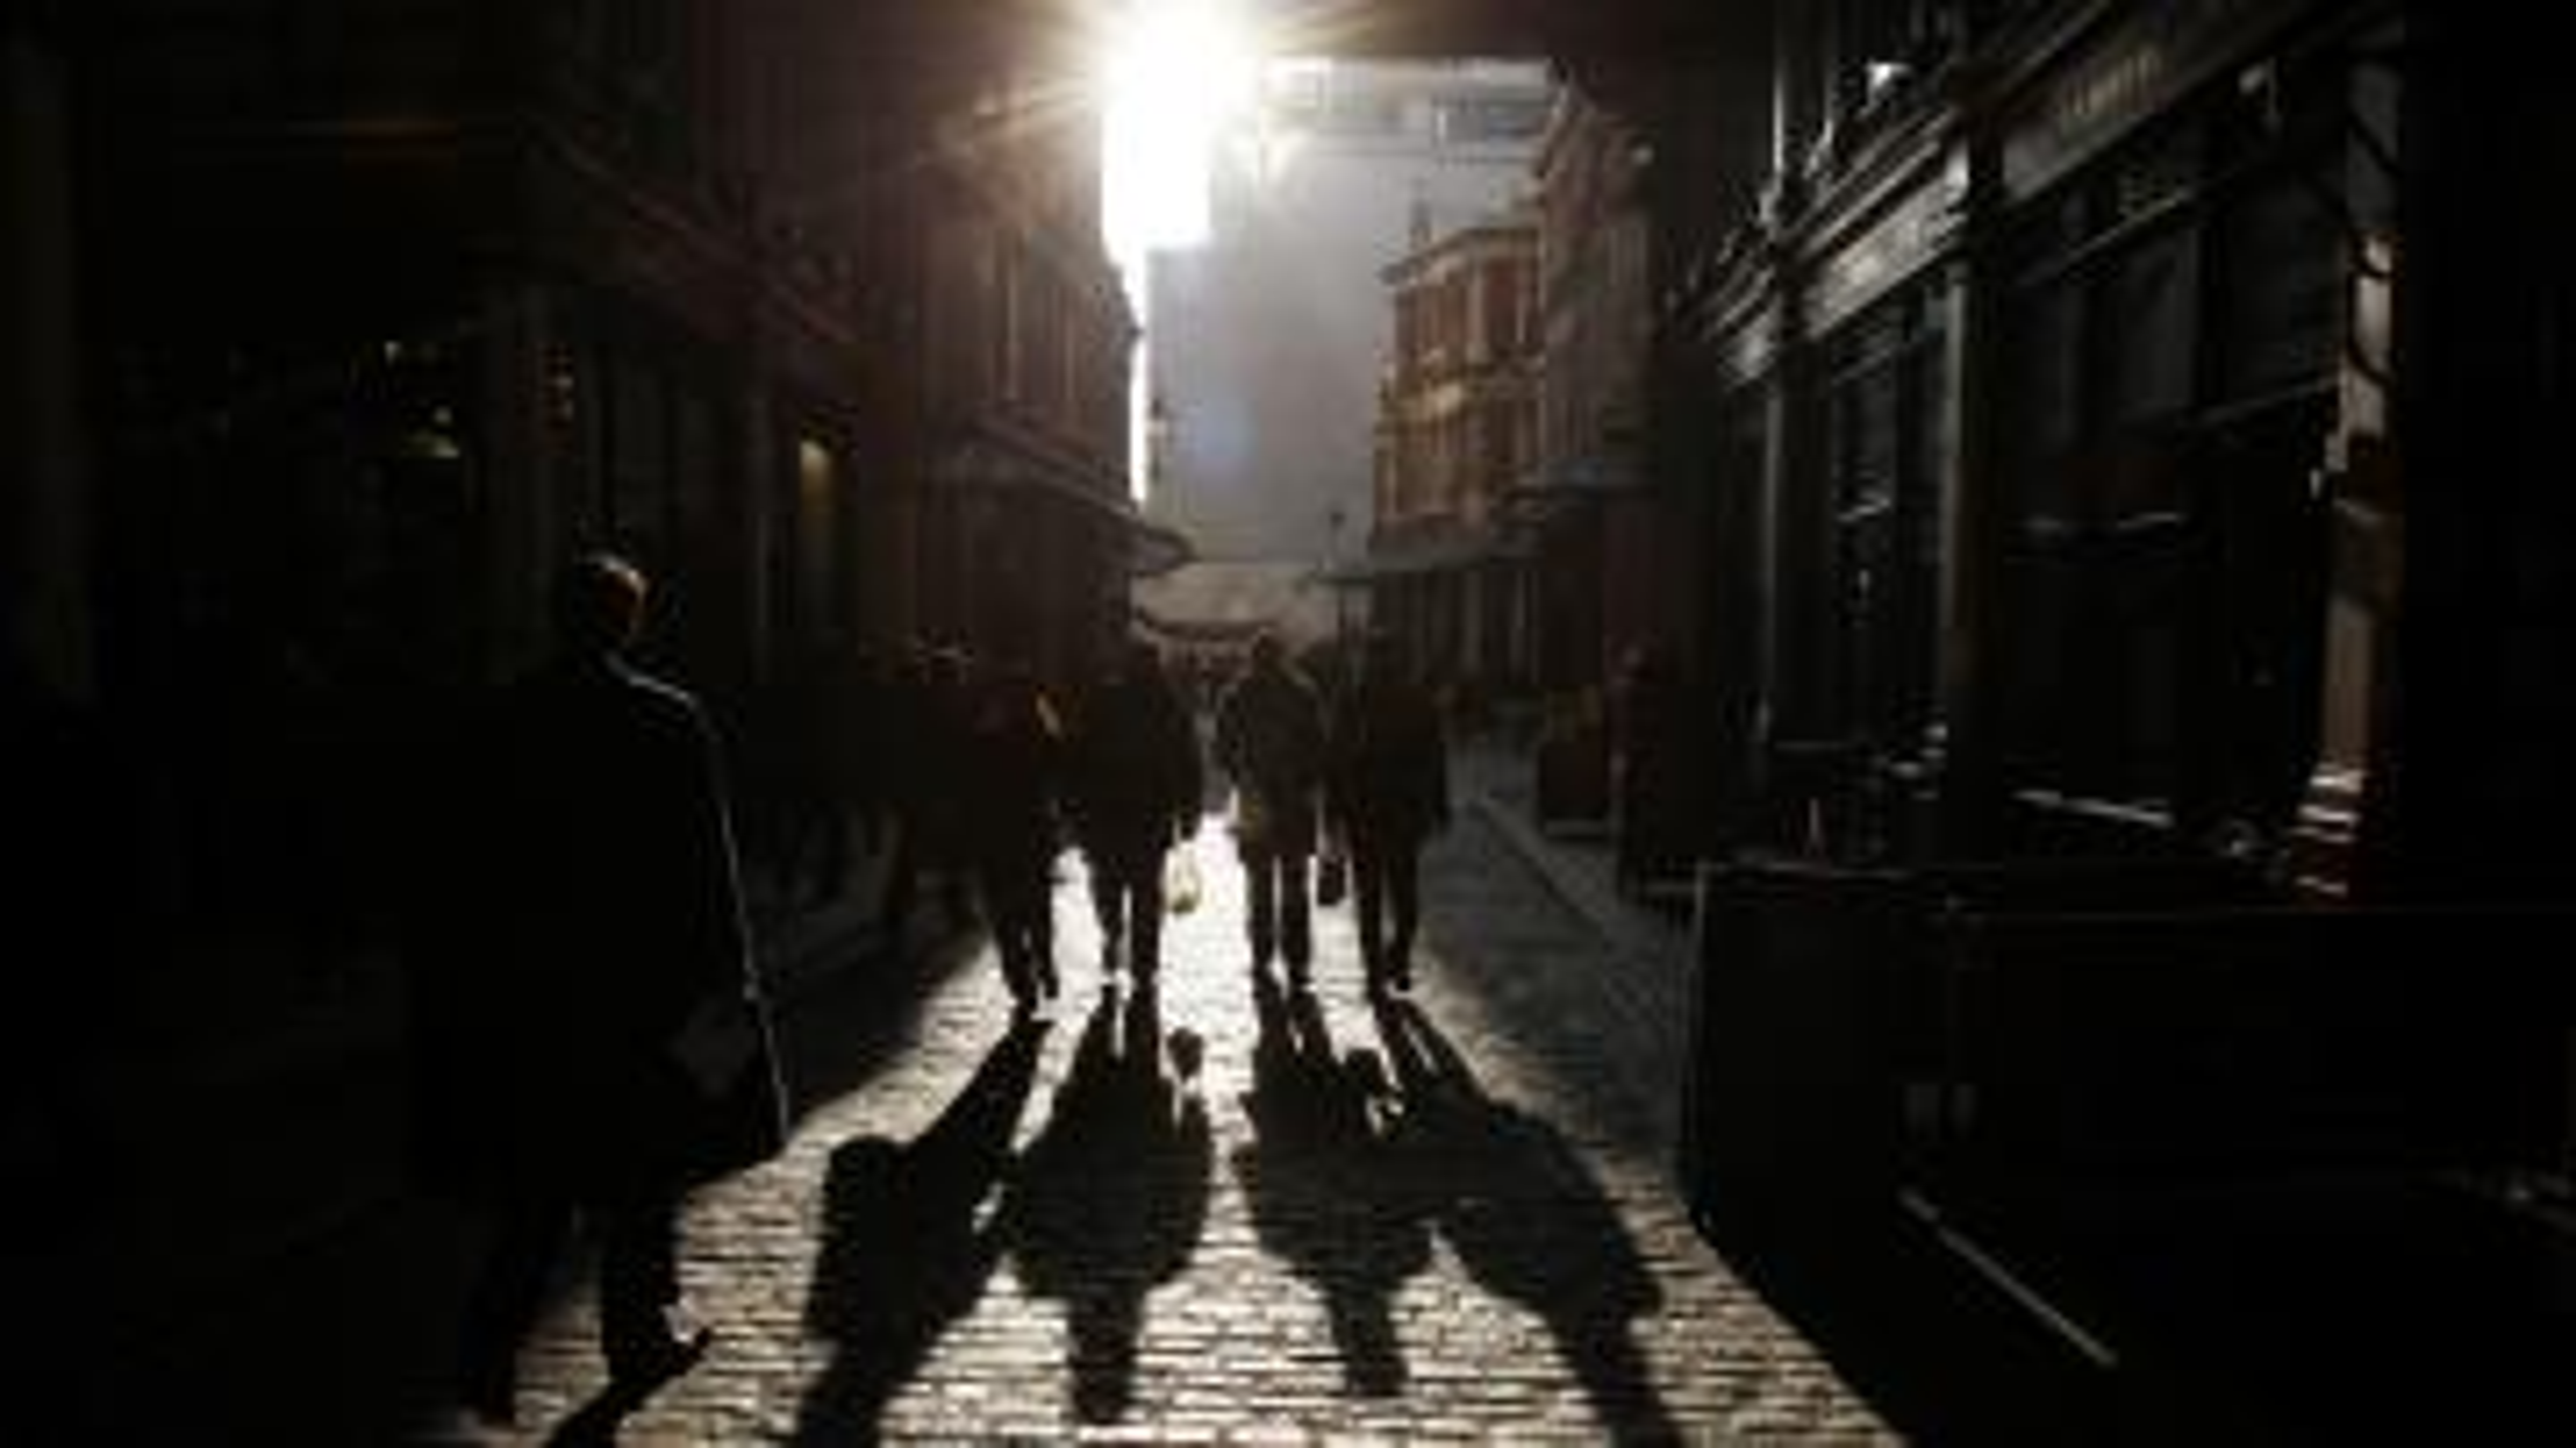 Leadenhall market casts a long shadow.